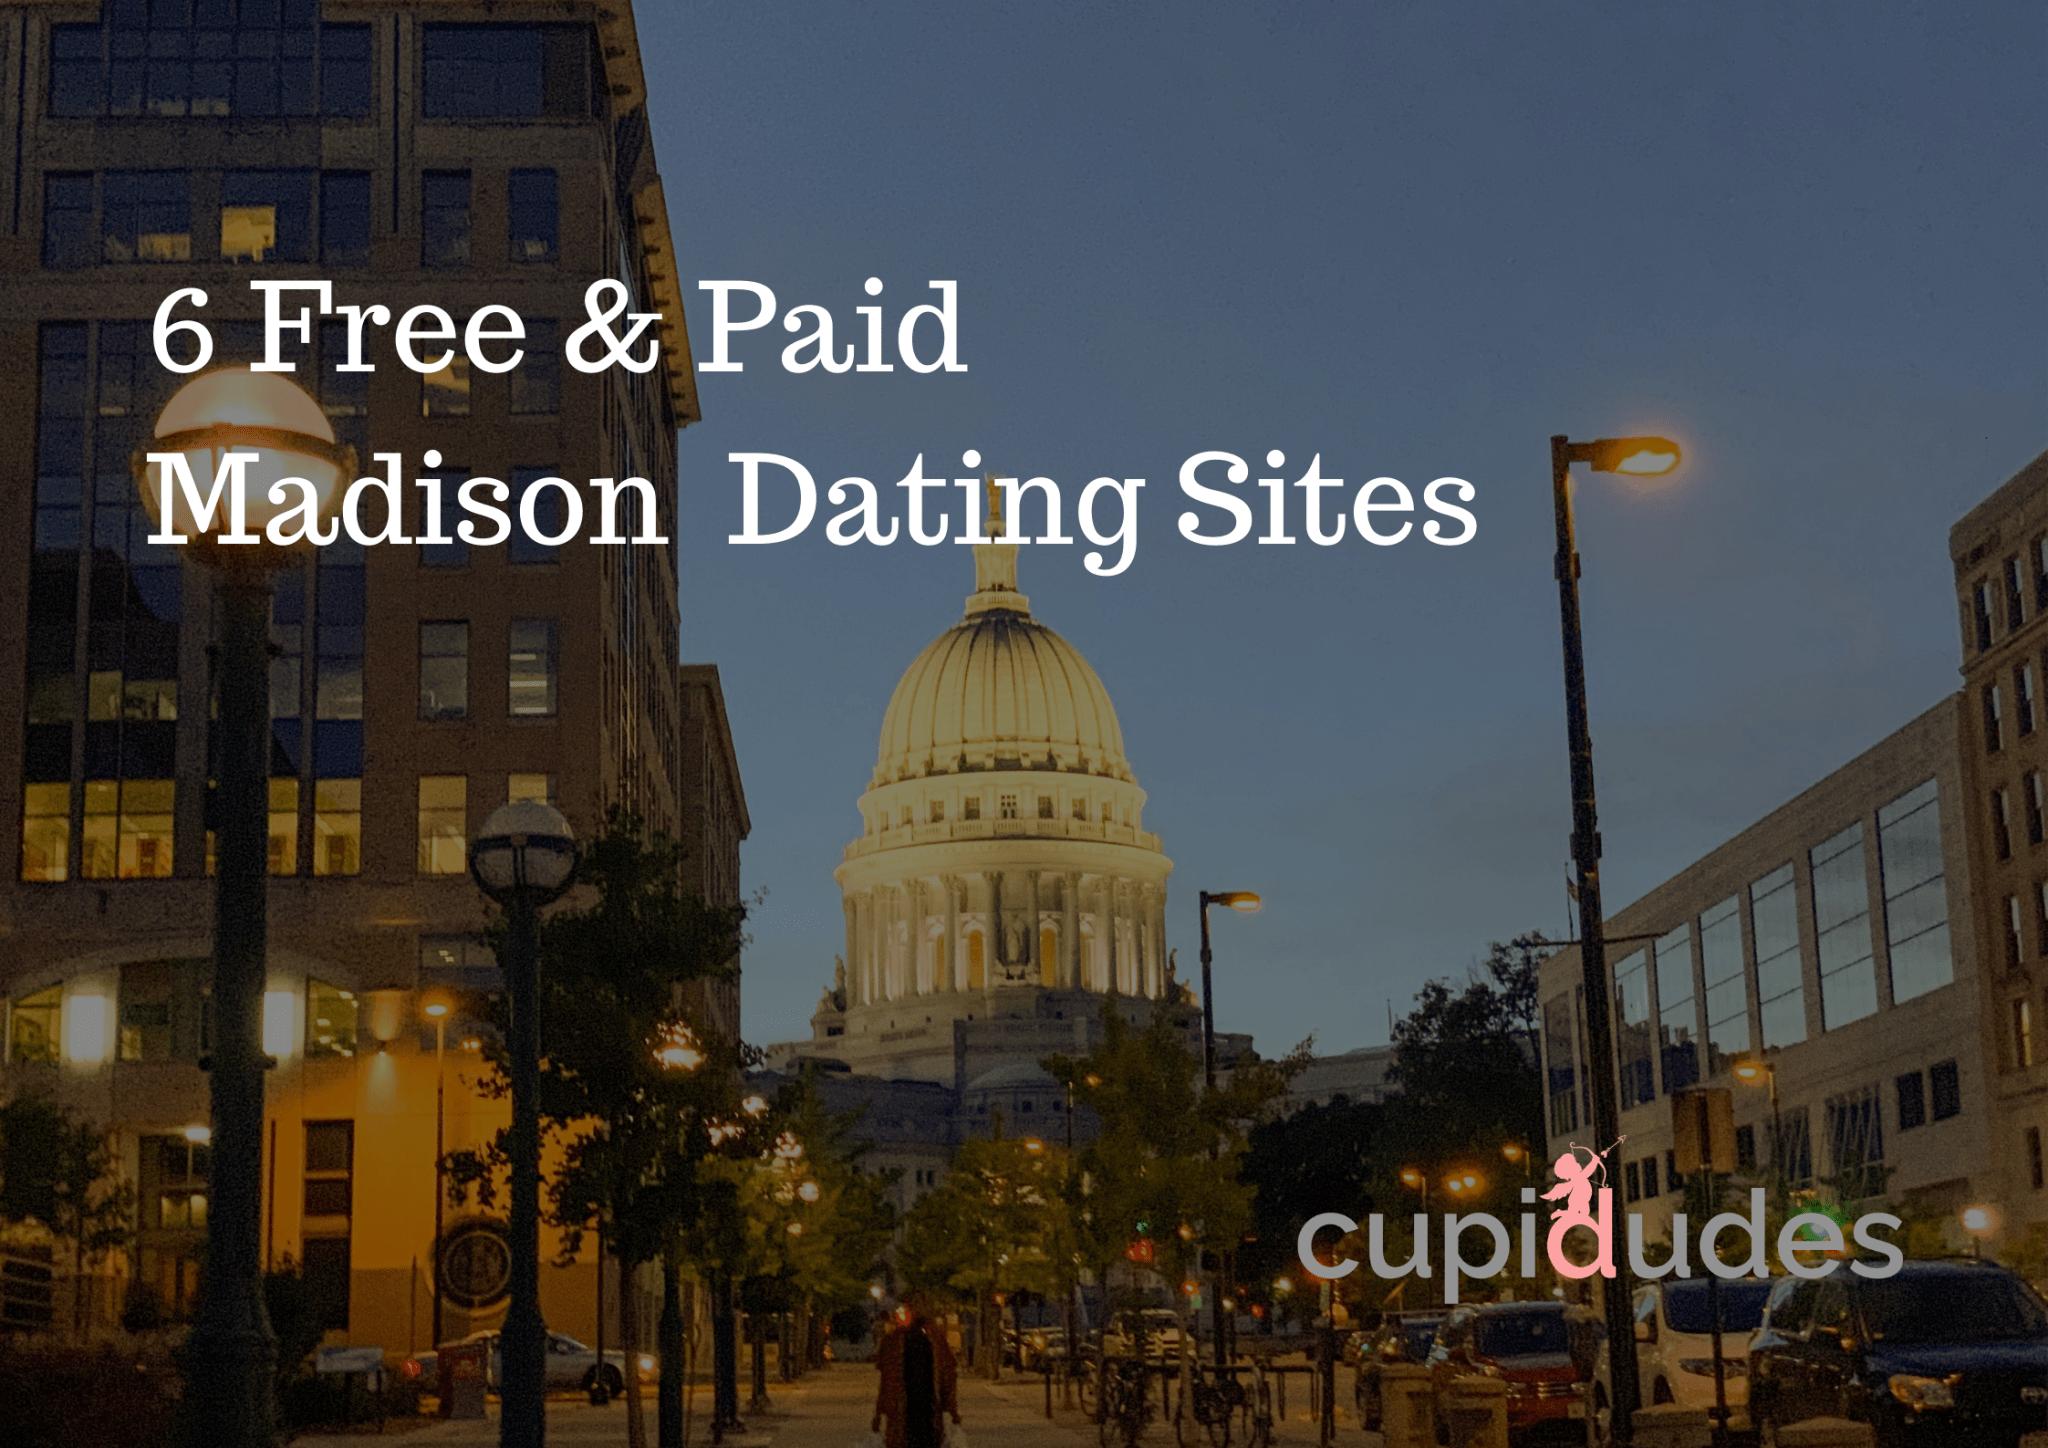 Madison Dating Sites